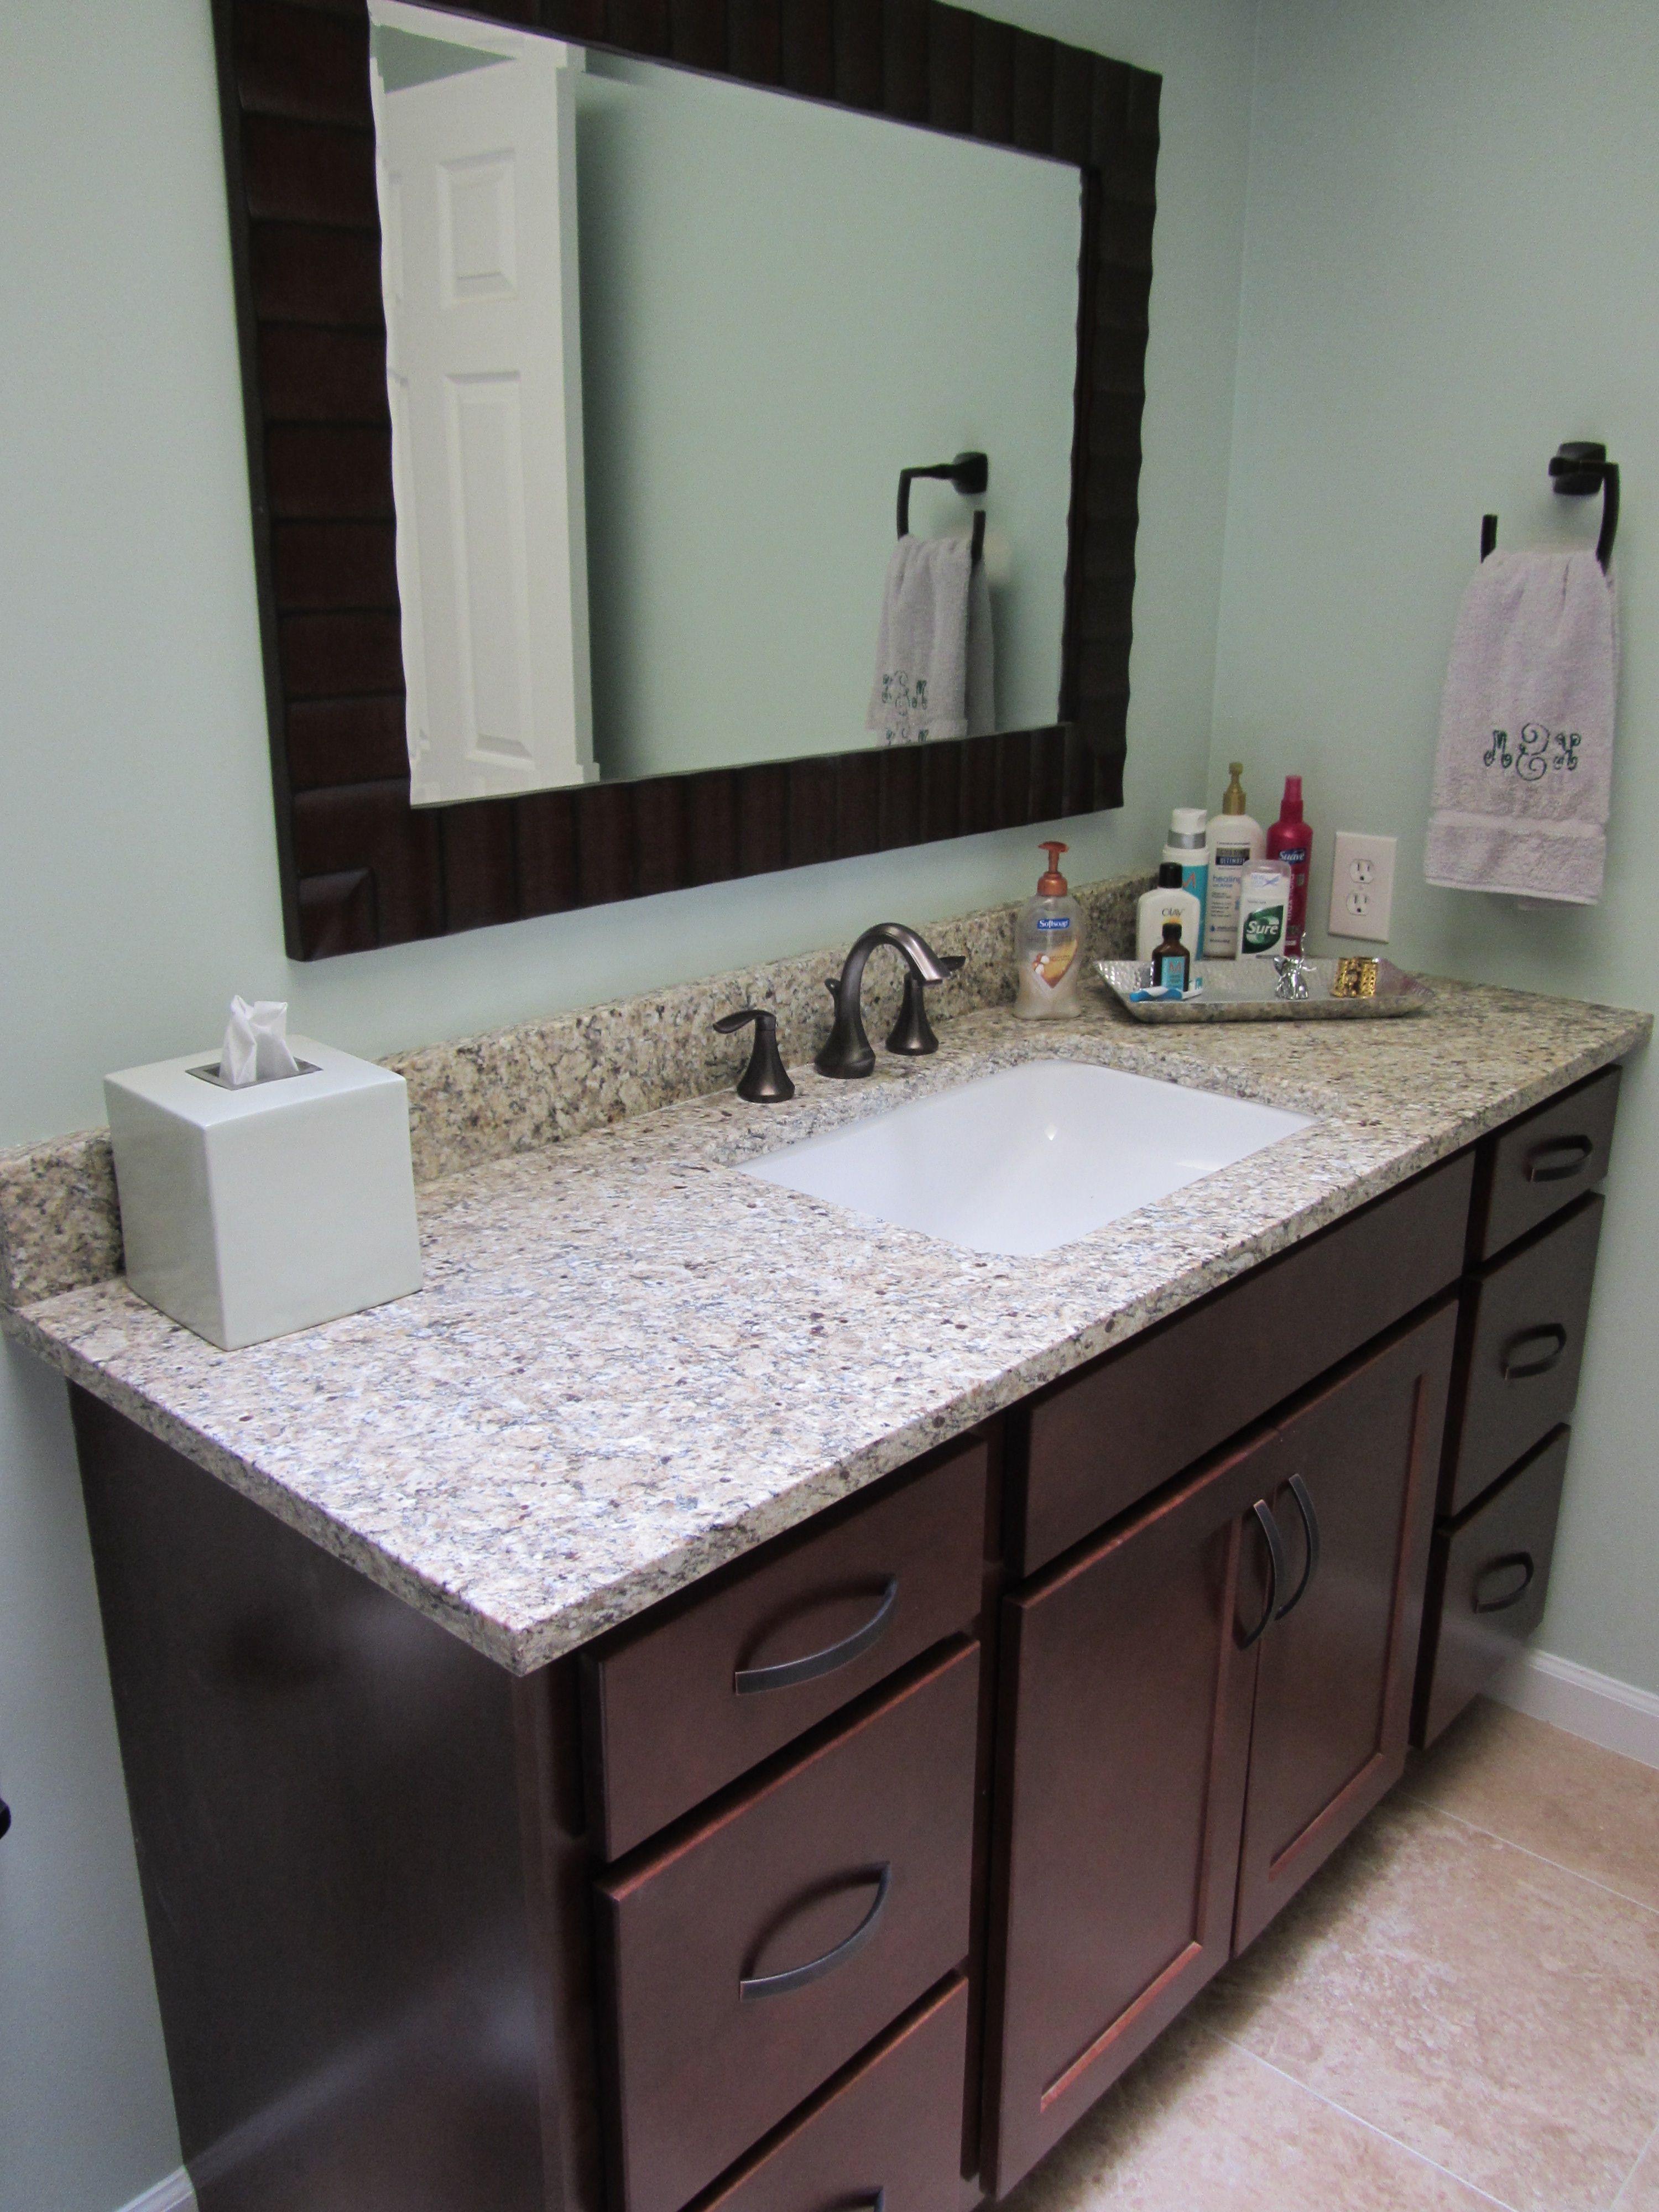 Home Depot Bathroom Vanity Tops Granite  Bathroom Ideas Magnificent White Bathroom Vanity Home Depot Inspiration